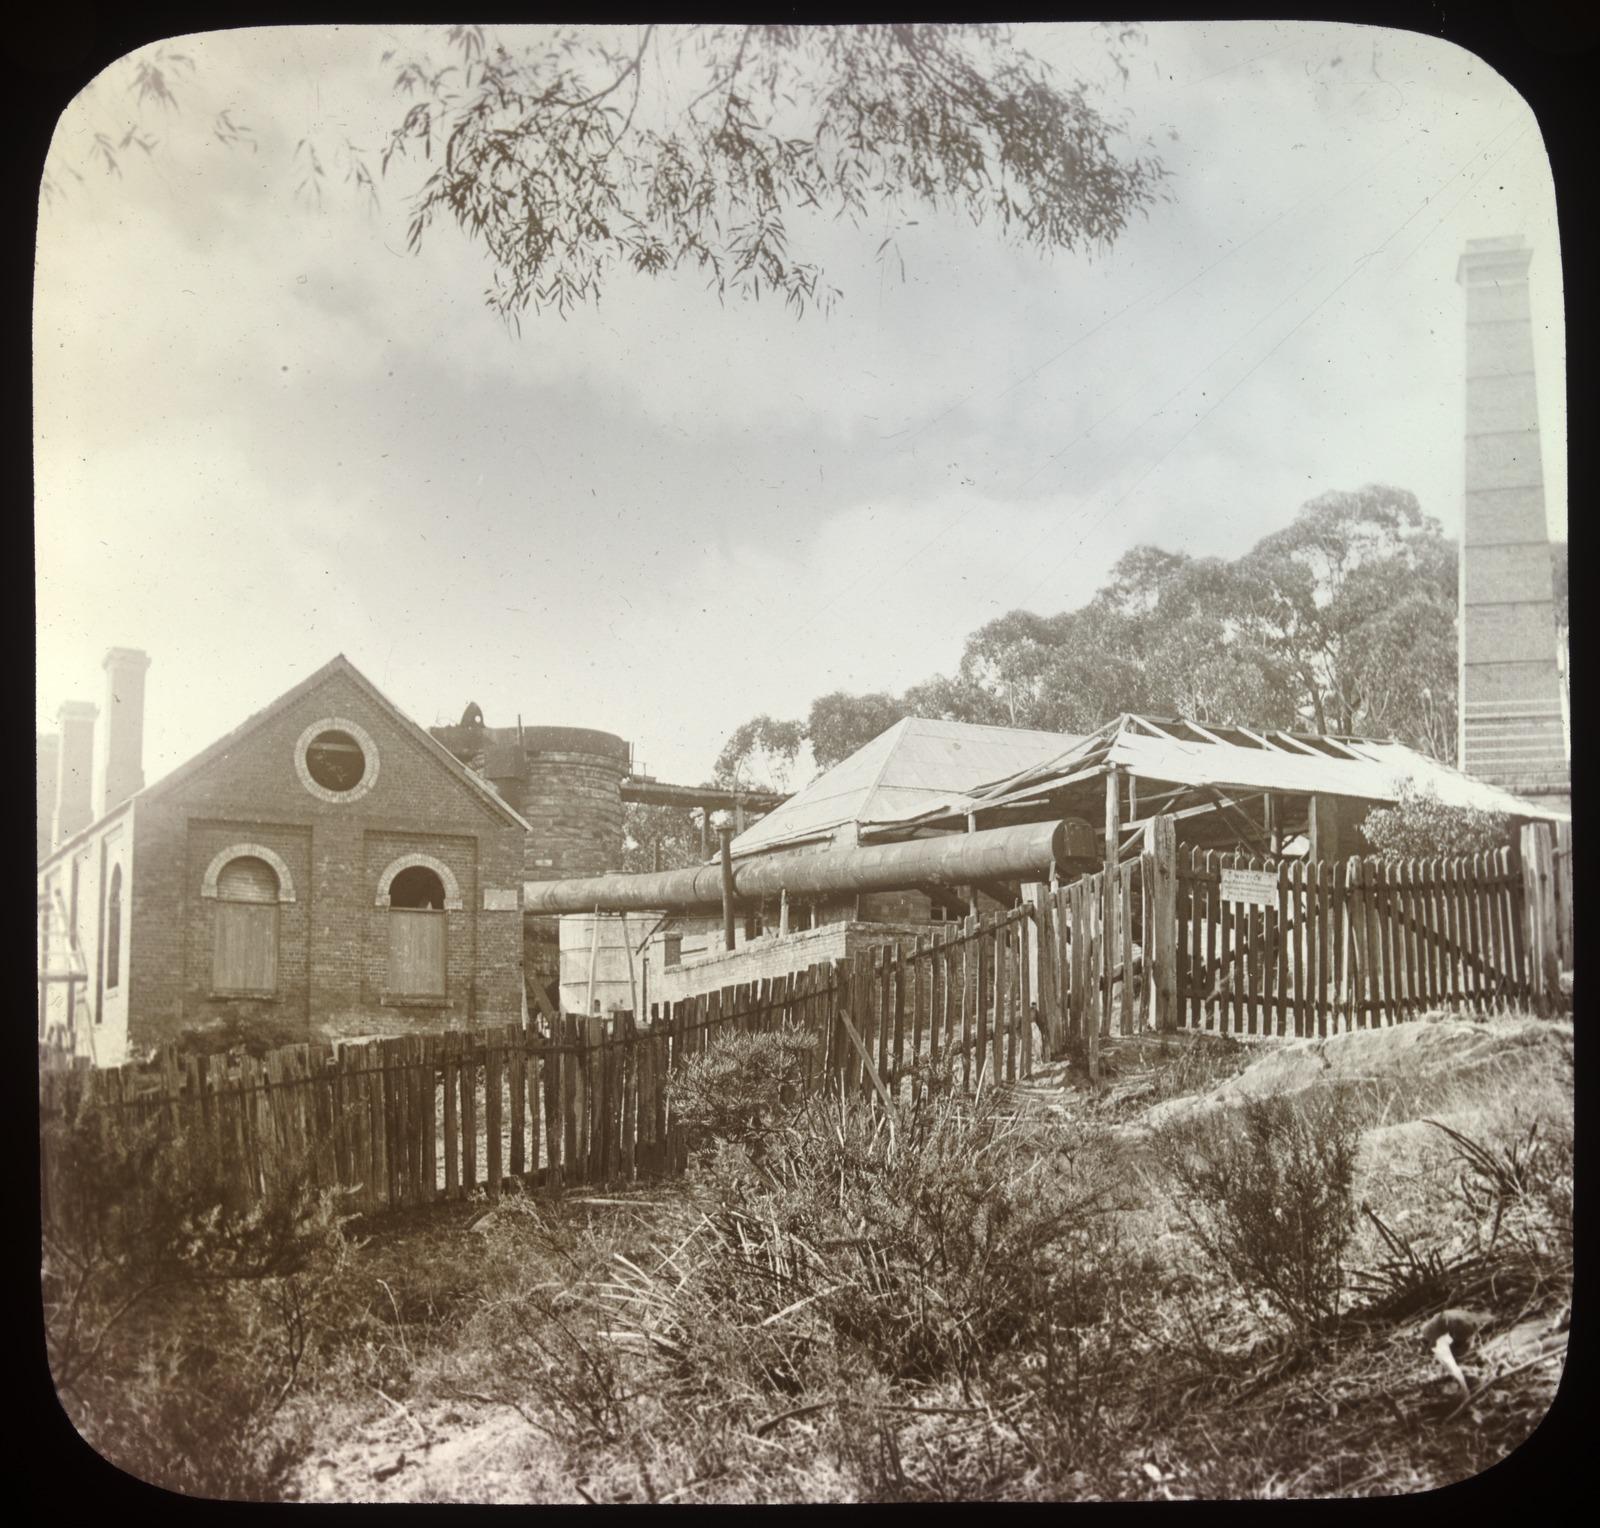 Fitzroy Iron Works - Wikipedia